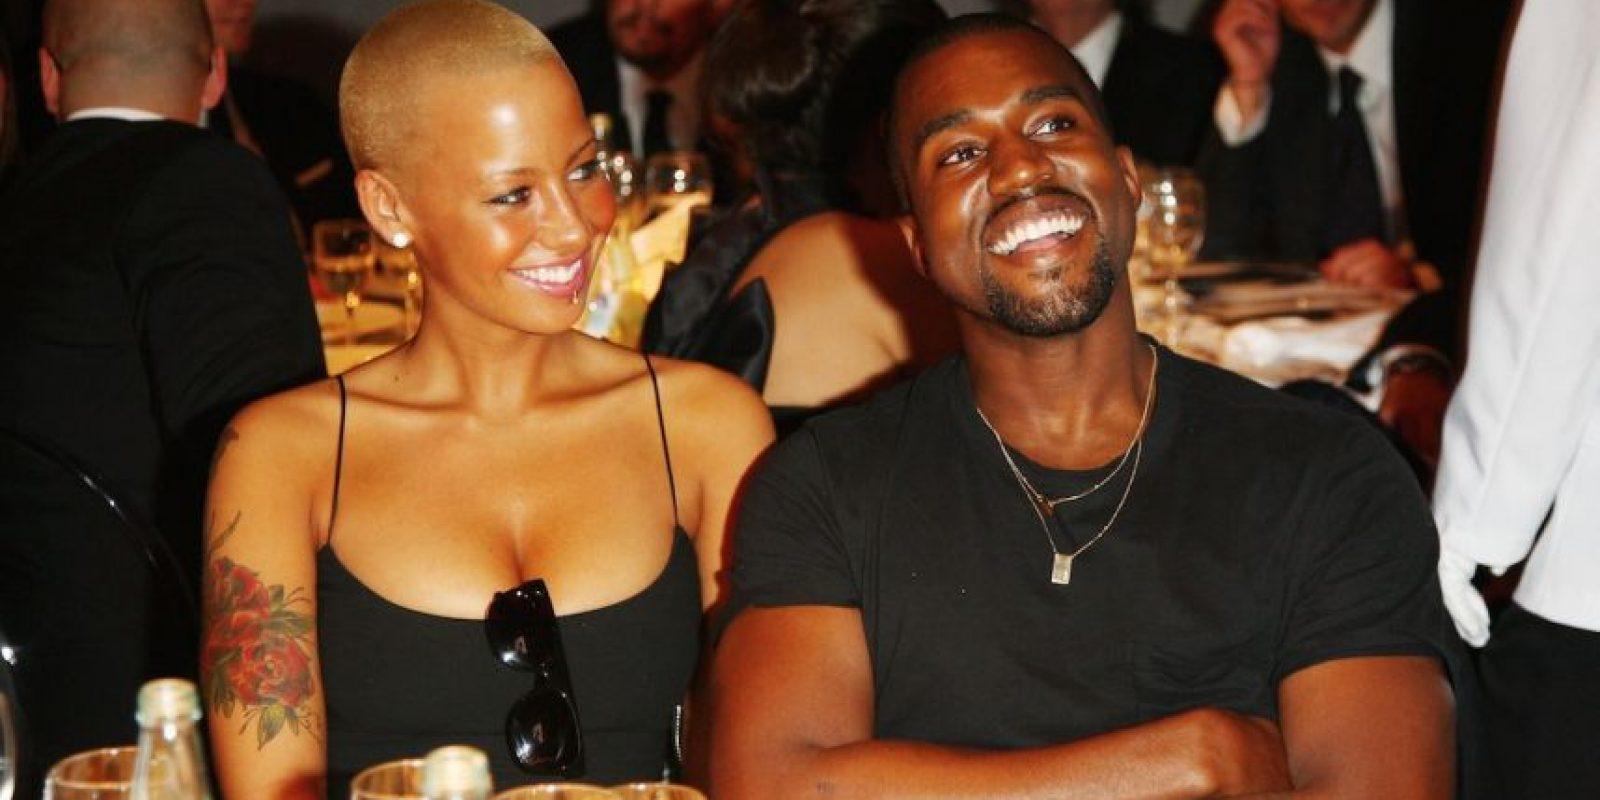 Un feliz momento de pareja Foto: Getty Images